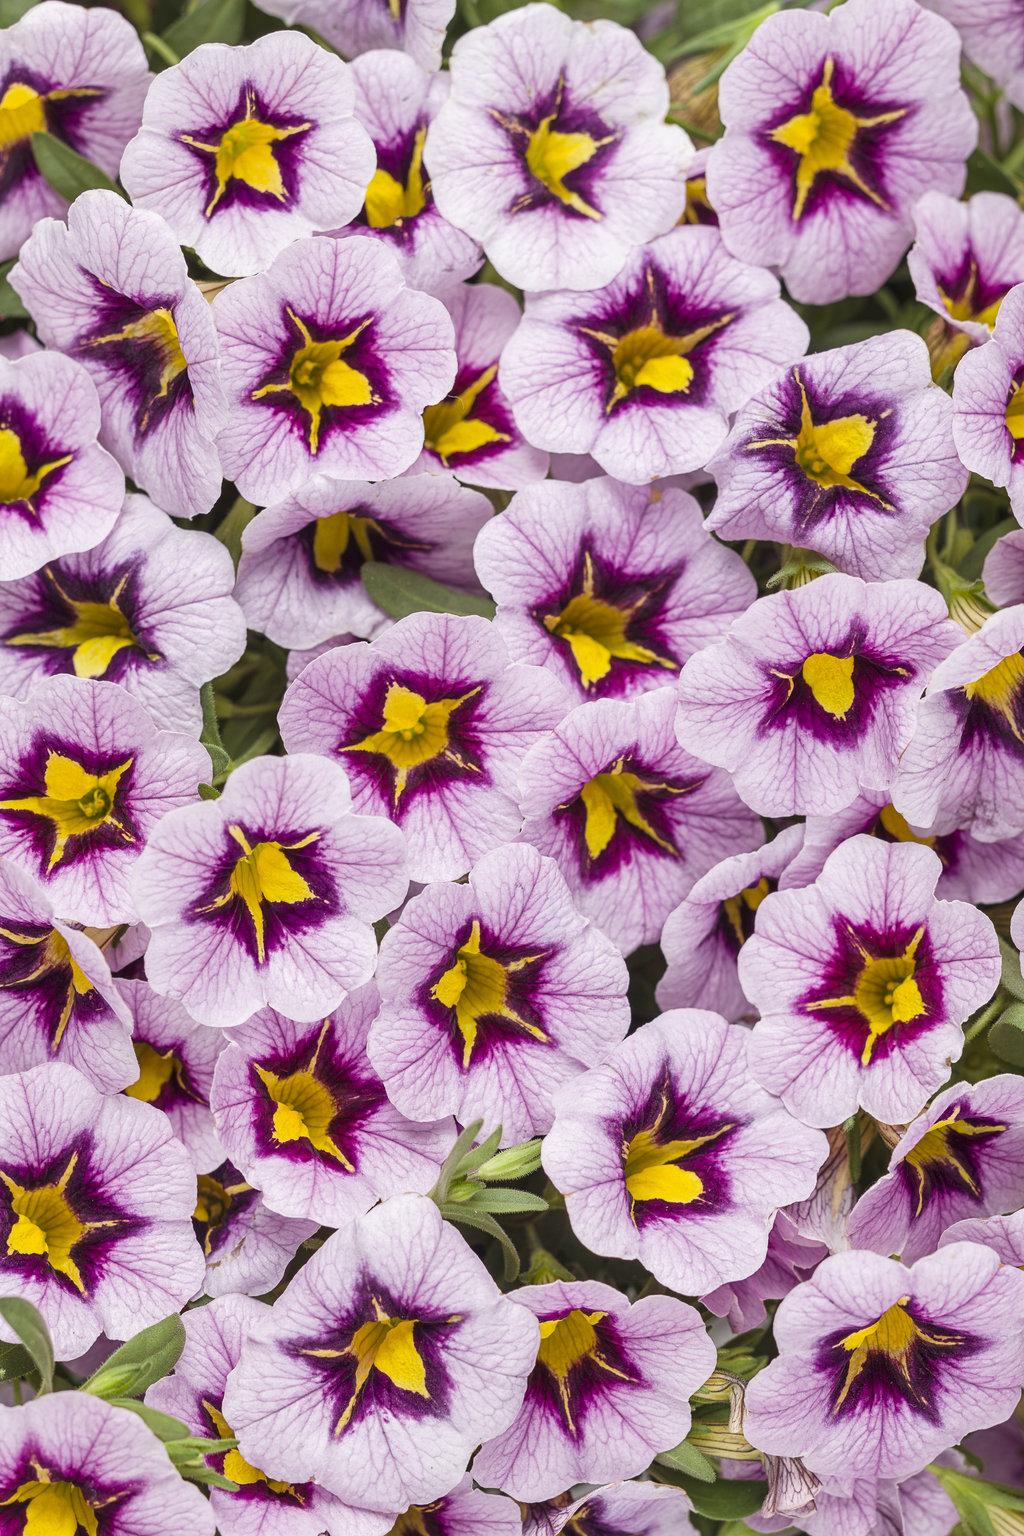 Superbells Morning Star Calibrachoa Hybrid Proven Winners